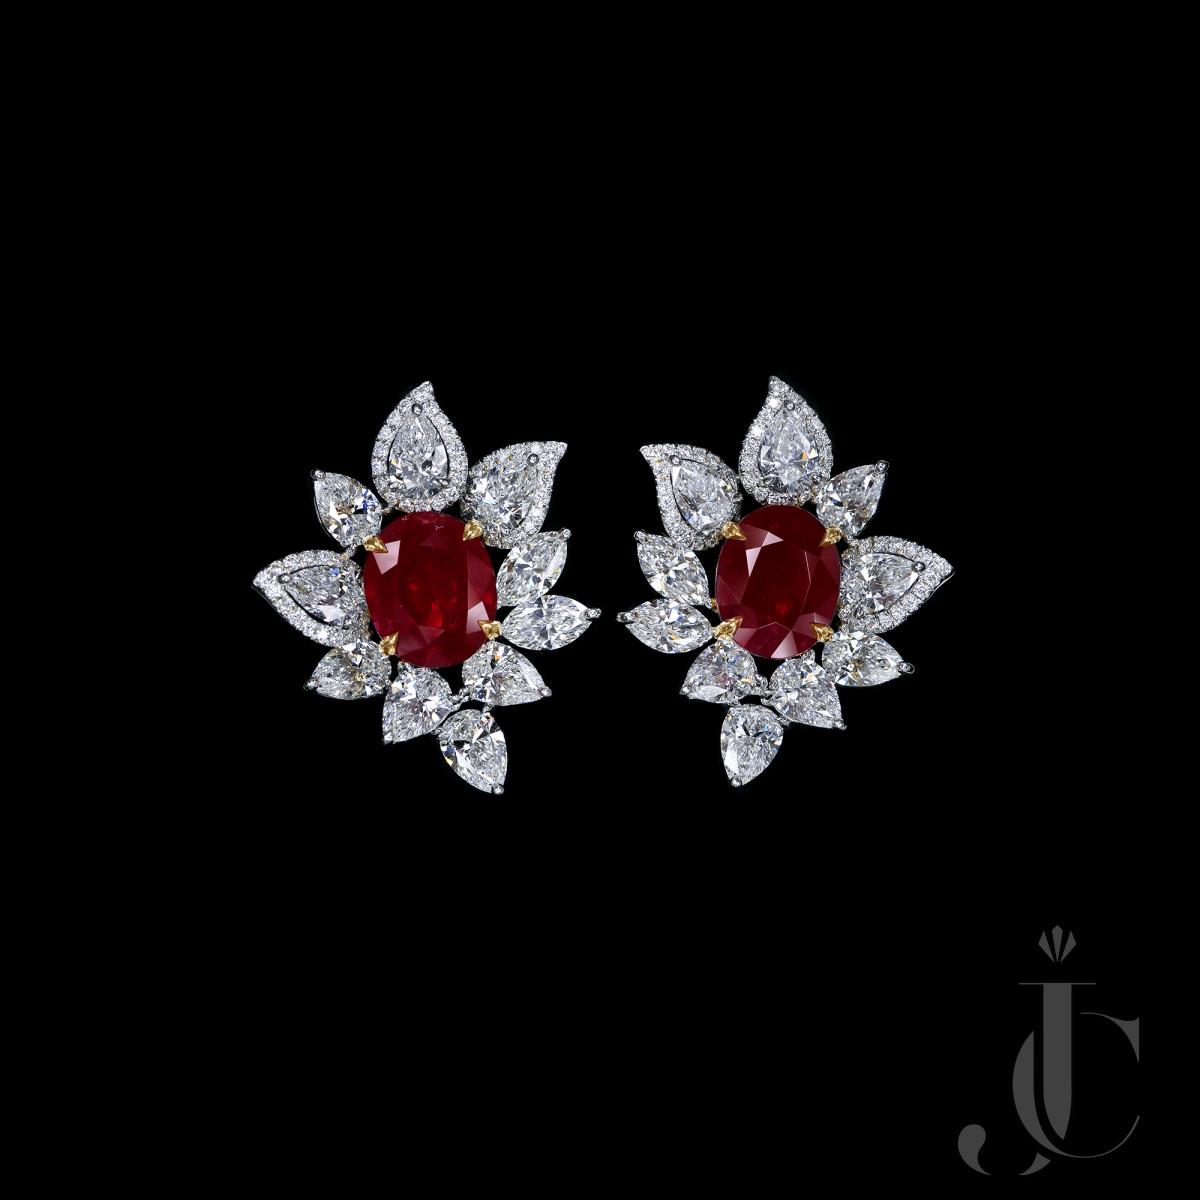 Over 3 carats each Pigeon Blood Unheated Burmese Ruby Diamond Earrings